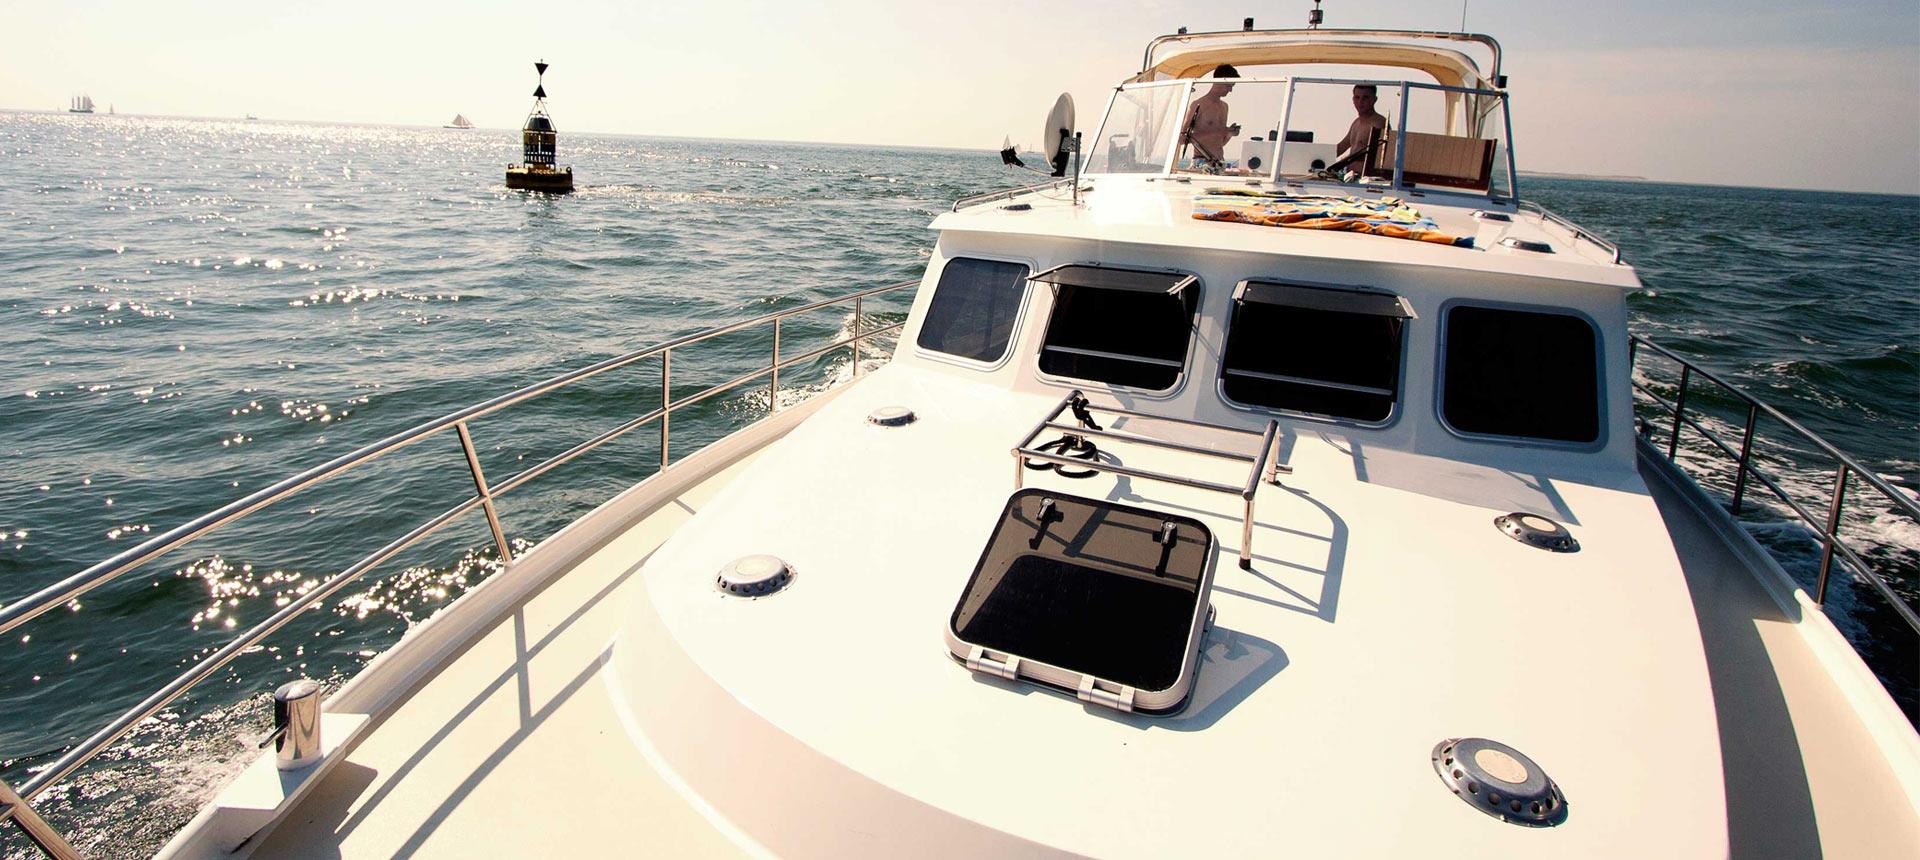 HW Yachtcharter